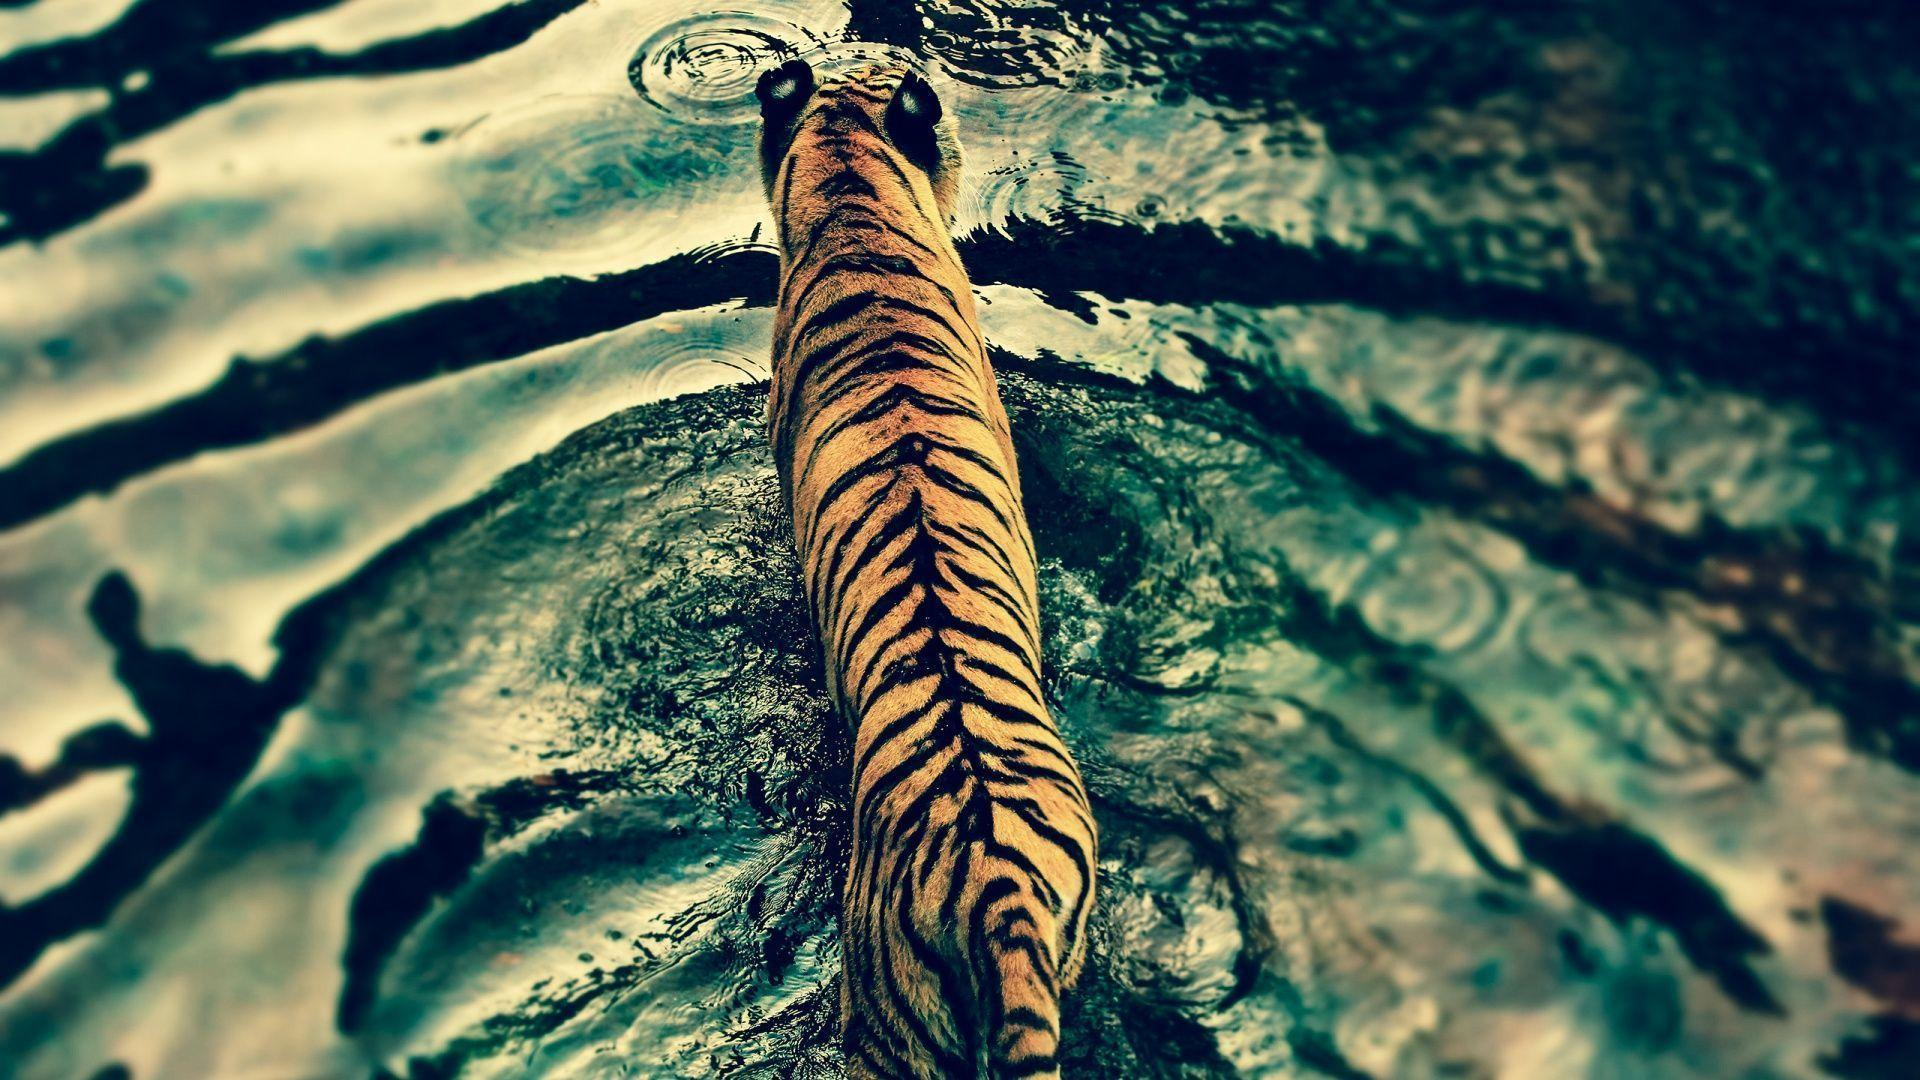 Tiger Wallpaper Windows Seven #10851 Wallpaper | Cool ...